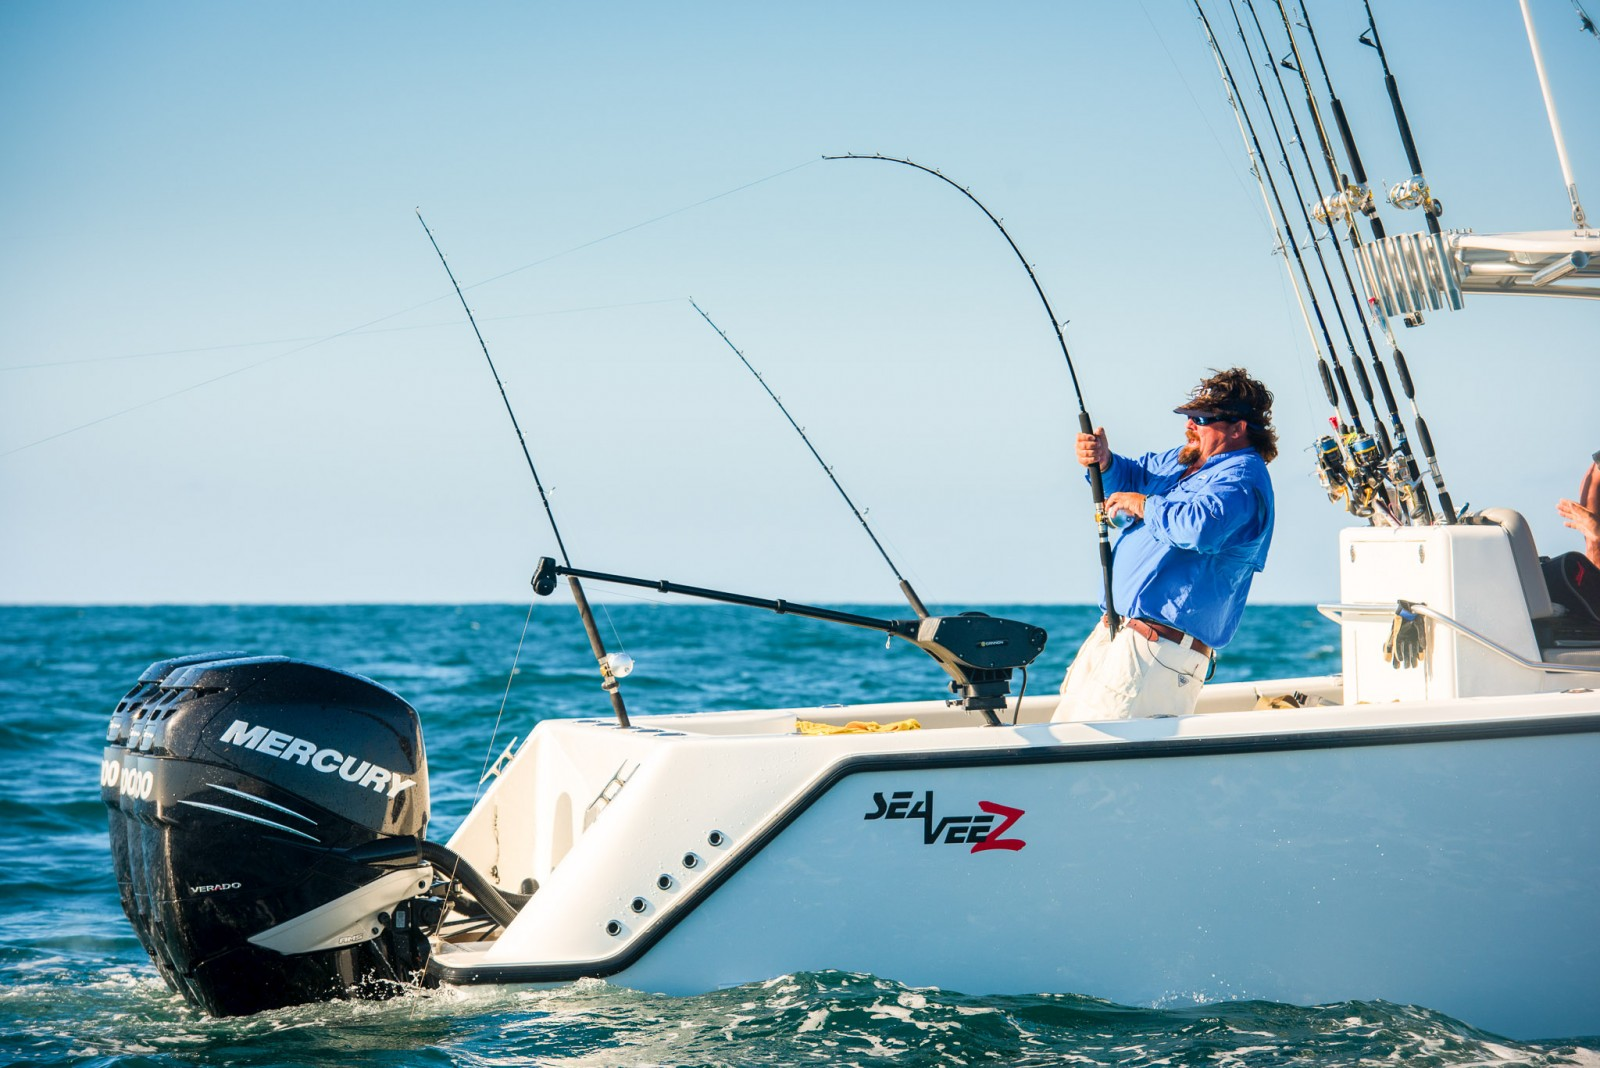 Punta abreojos punta abreojos fishing baja california for Baja california fishing